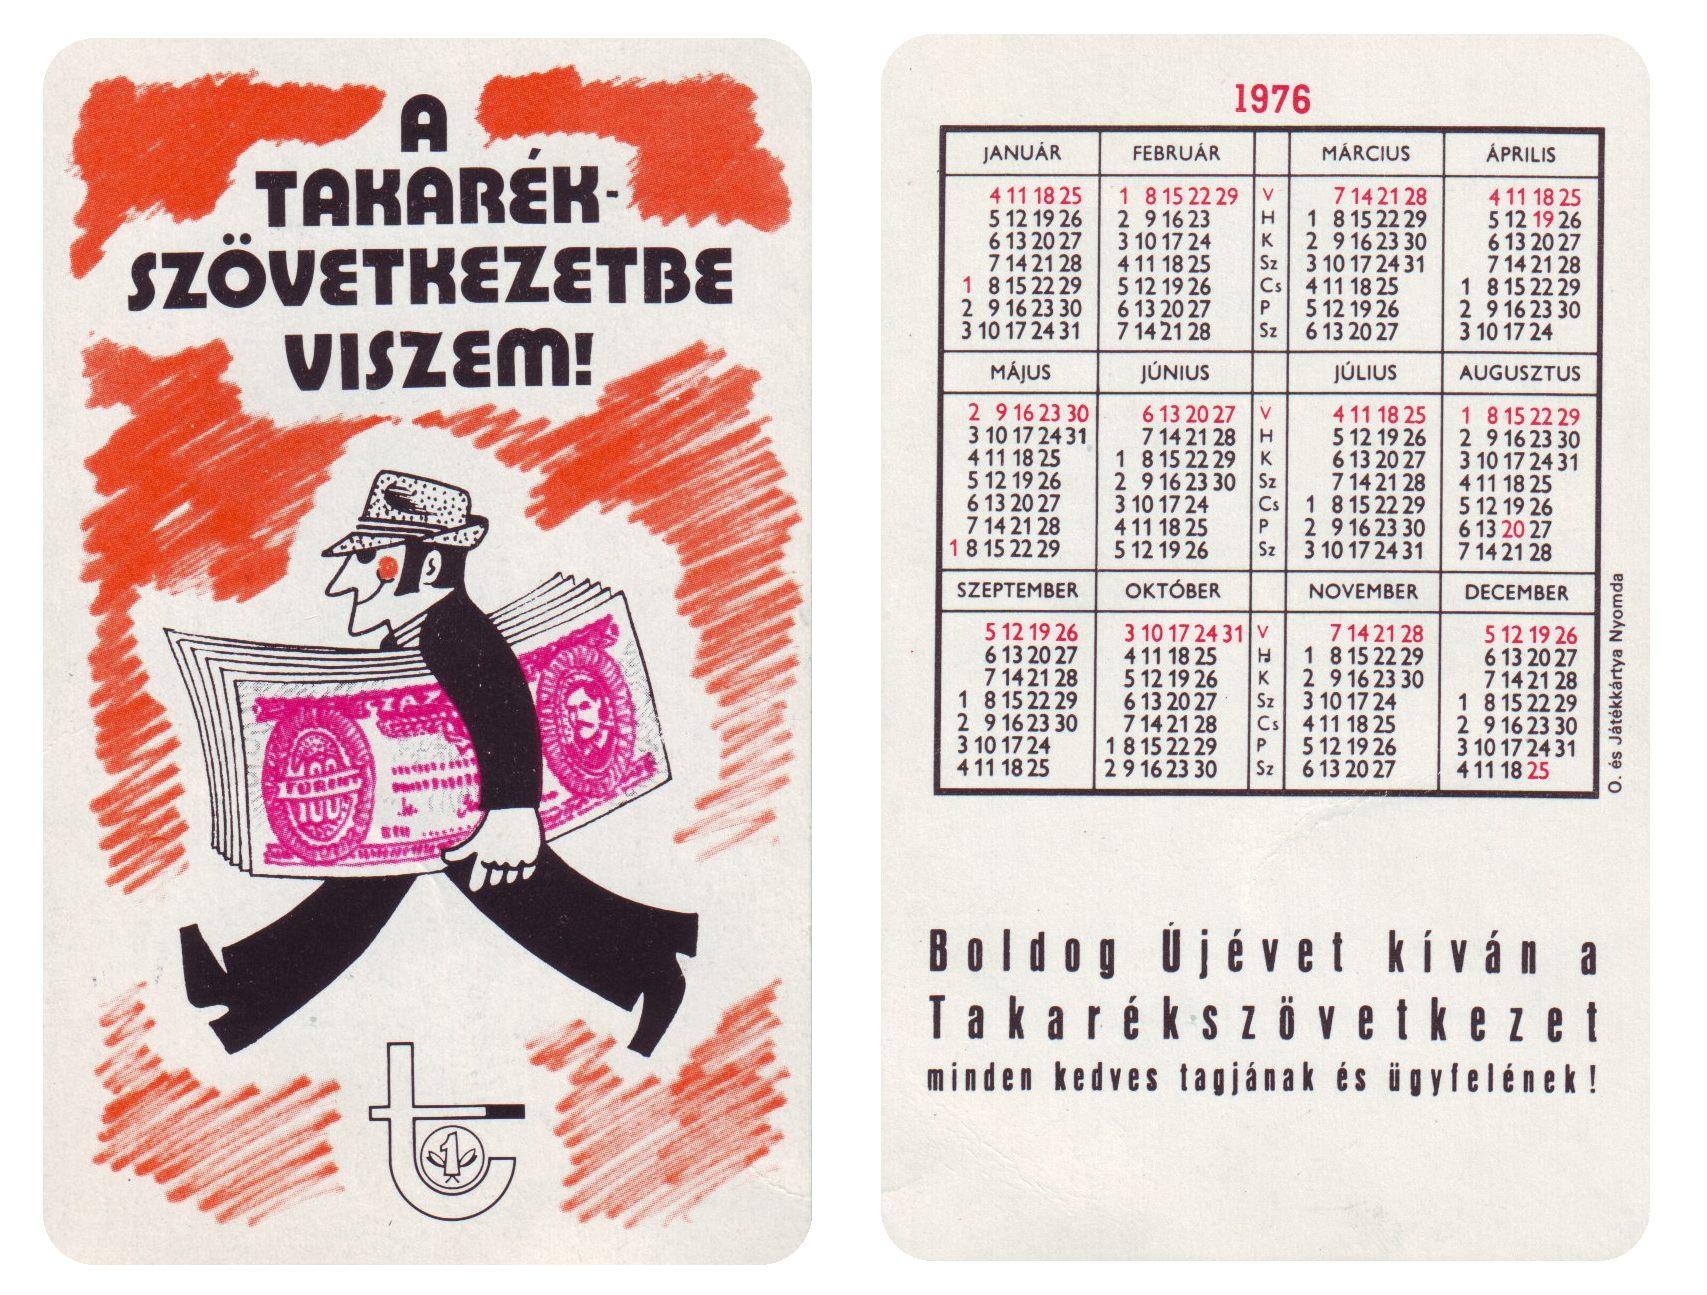 http://www.forintportal.hu/kartyanaptar/www_forintportal_hu_1976_kartyanaptar_028_nagy.jpg